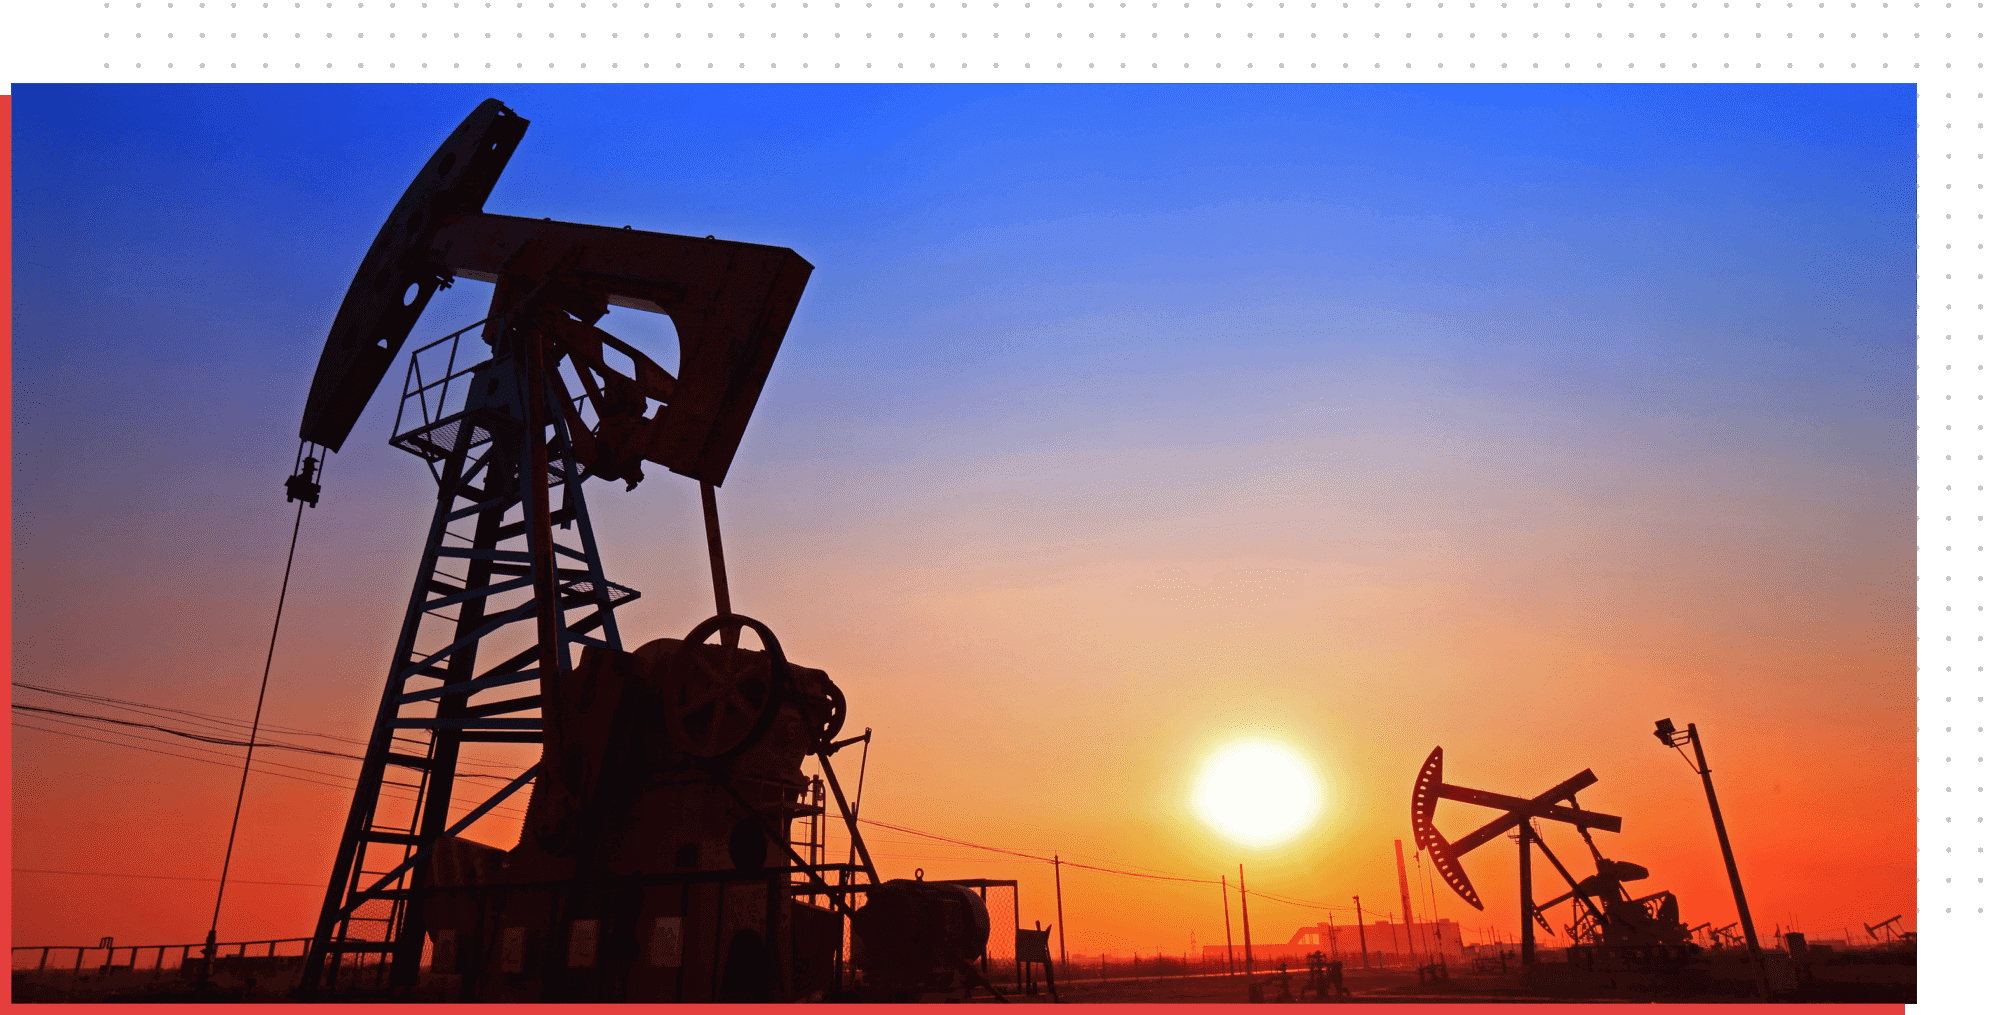 جوشکار در صنعت نفت4